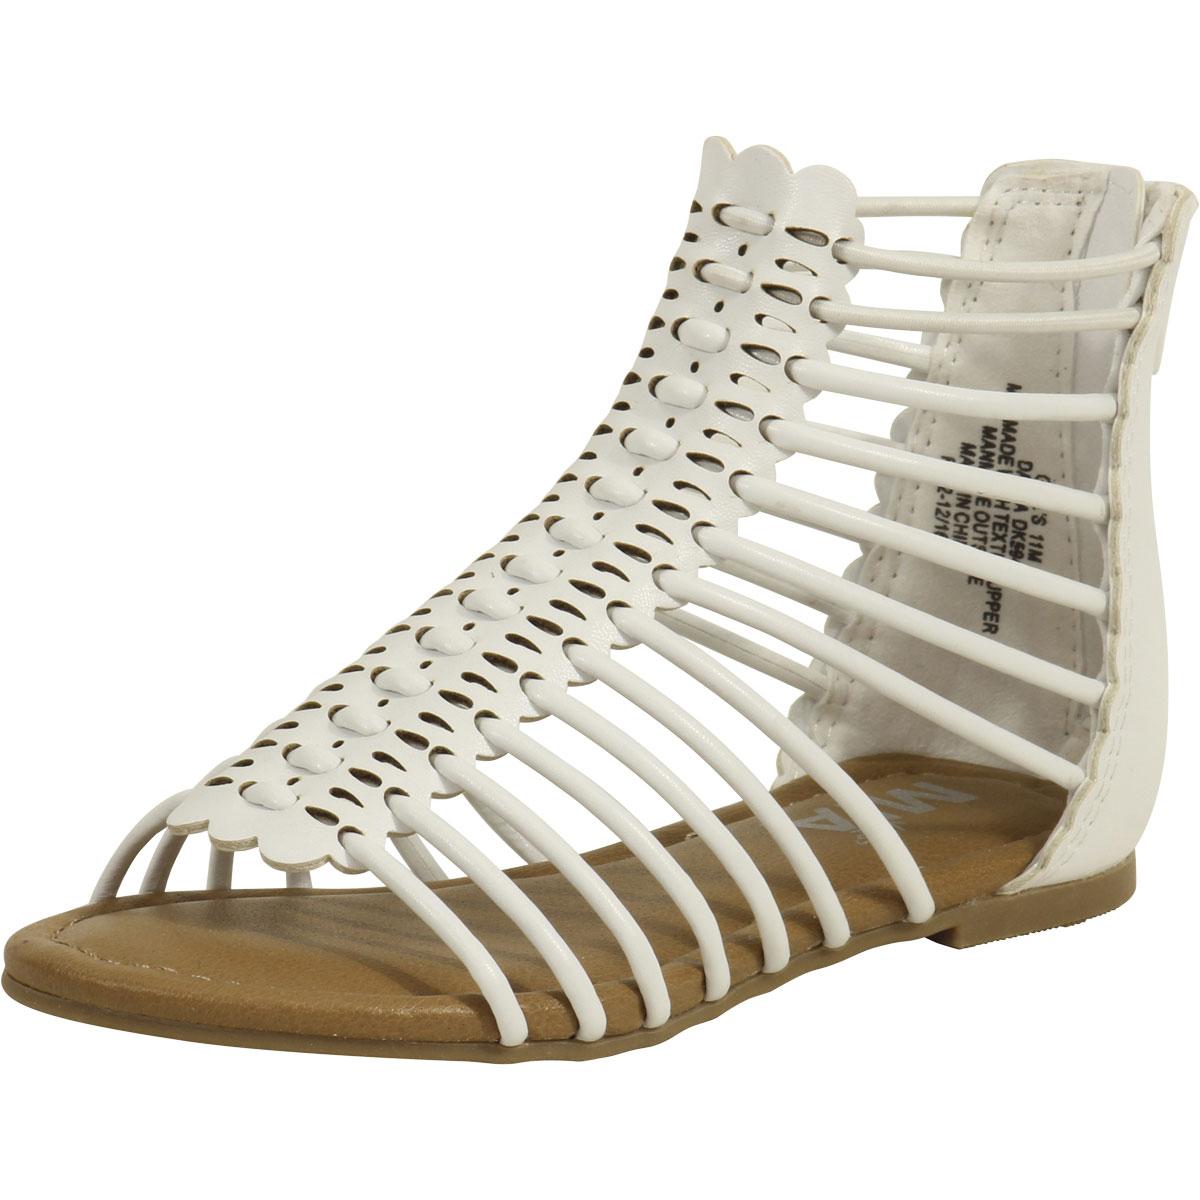 2ef99ed159f Mia Kids Little Big Girl s Darla White Caged Gladiator Sandals Shoes ...